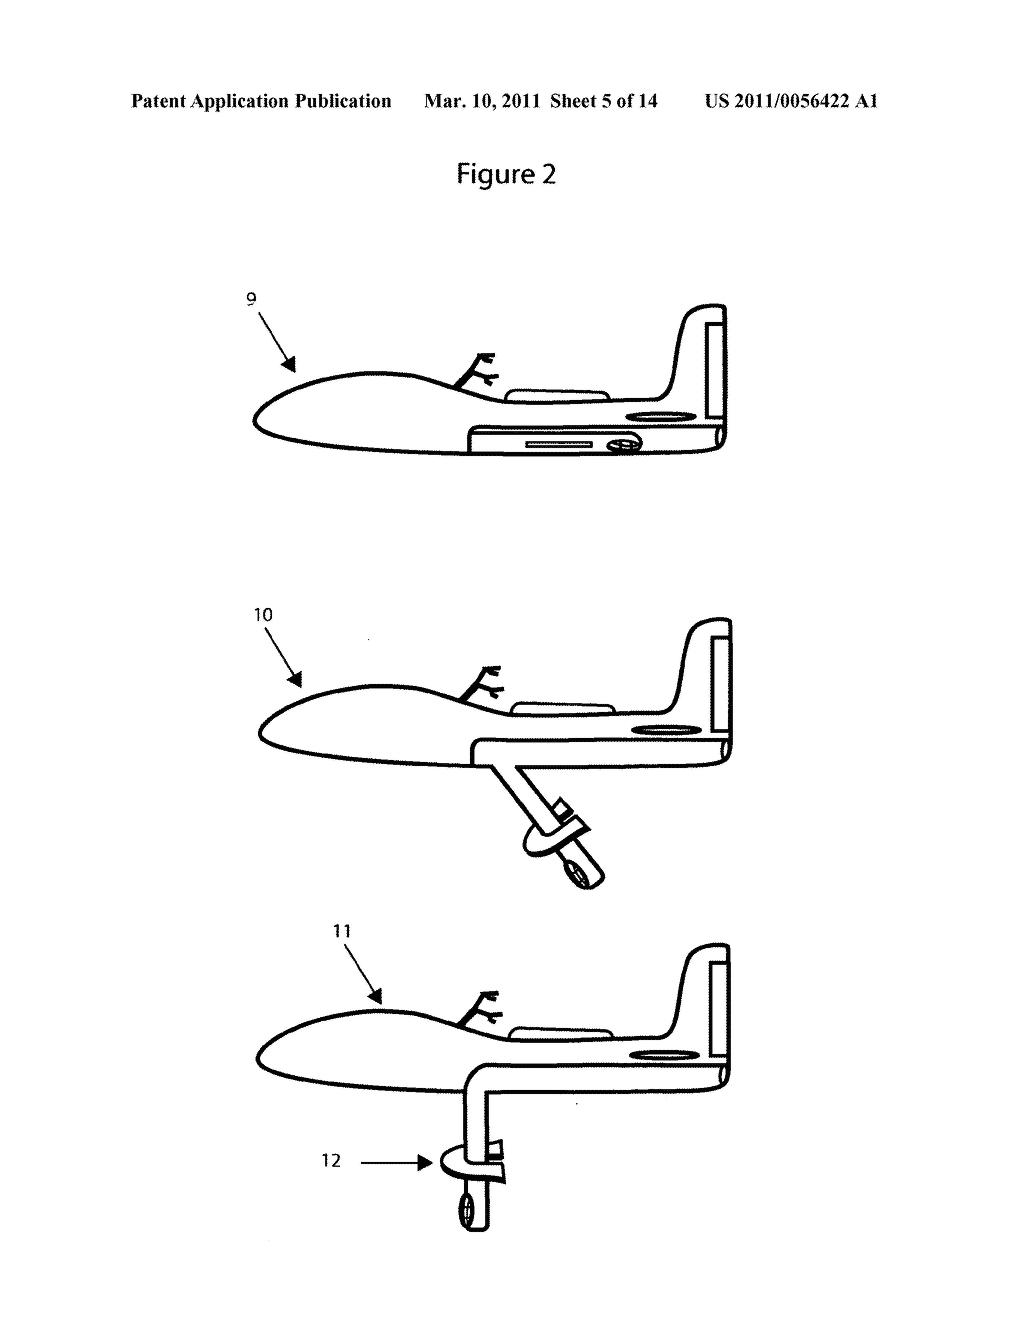 Kawasaki Gt 750 Wiring Diagram on